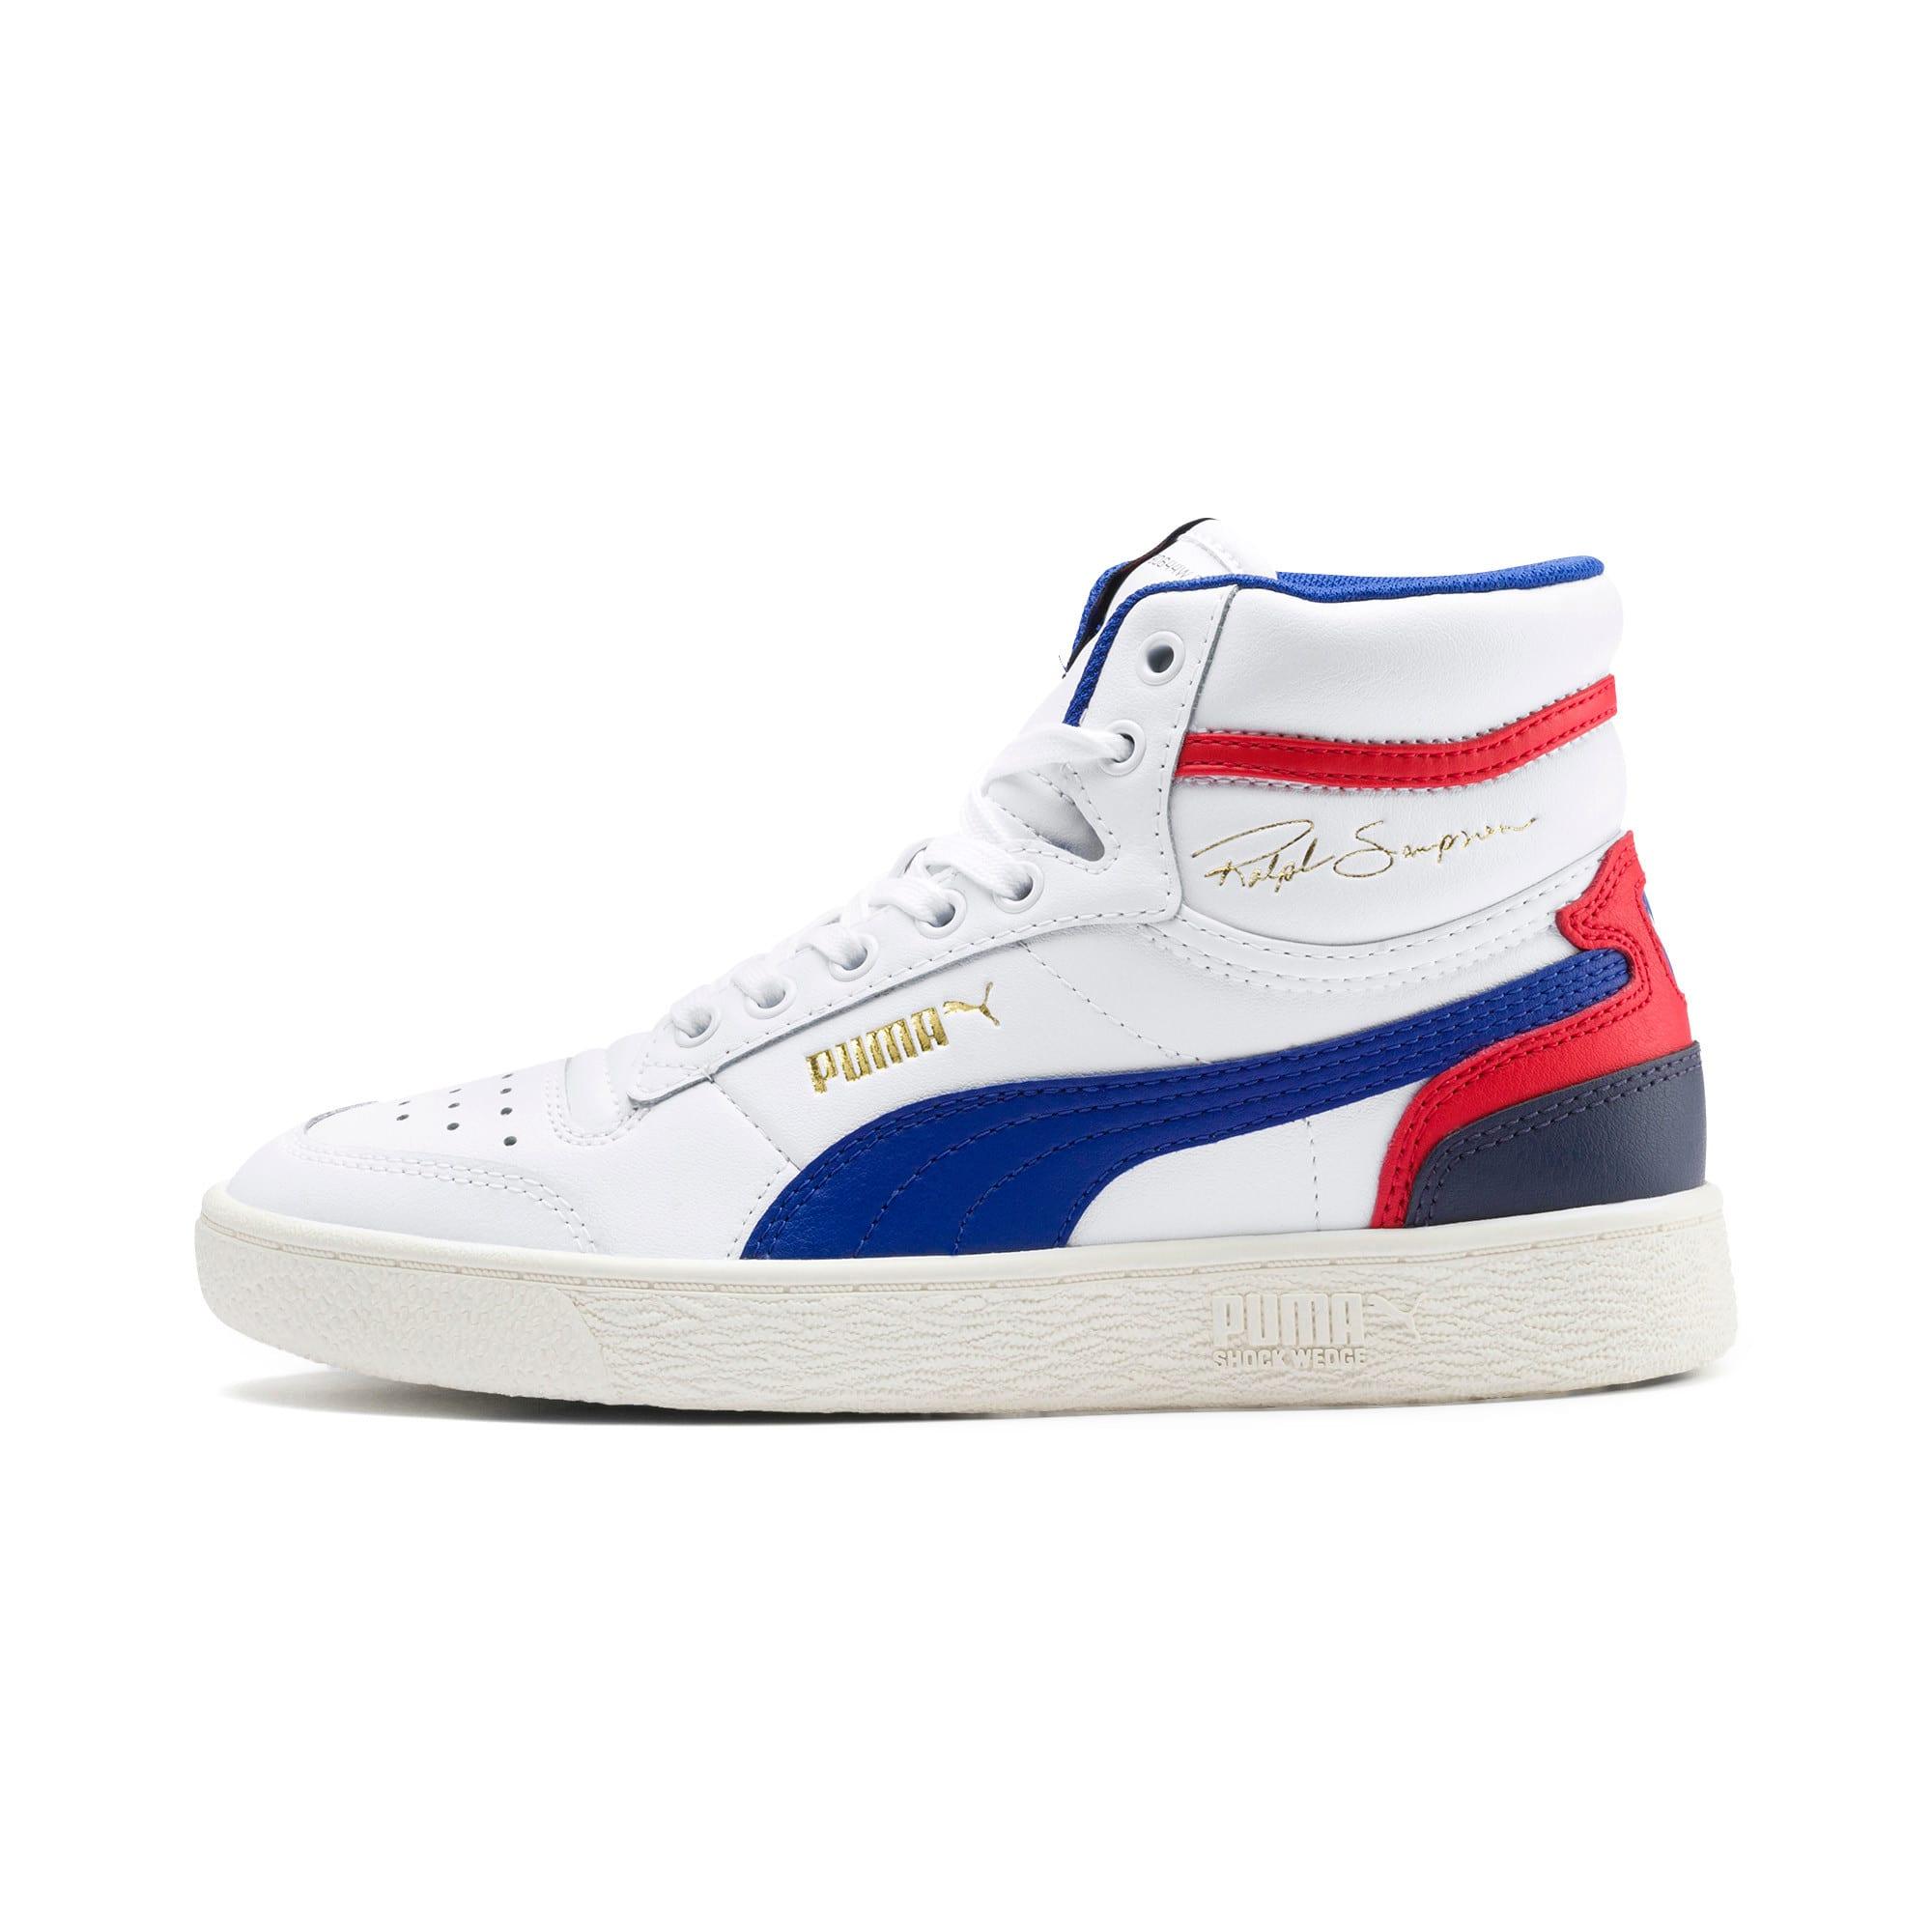 Thumbnail 1 of Ralph Sampson Mid Sneakers JR, White-SurfTheWeb-Marshmallow, medium